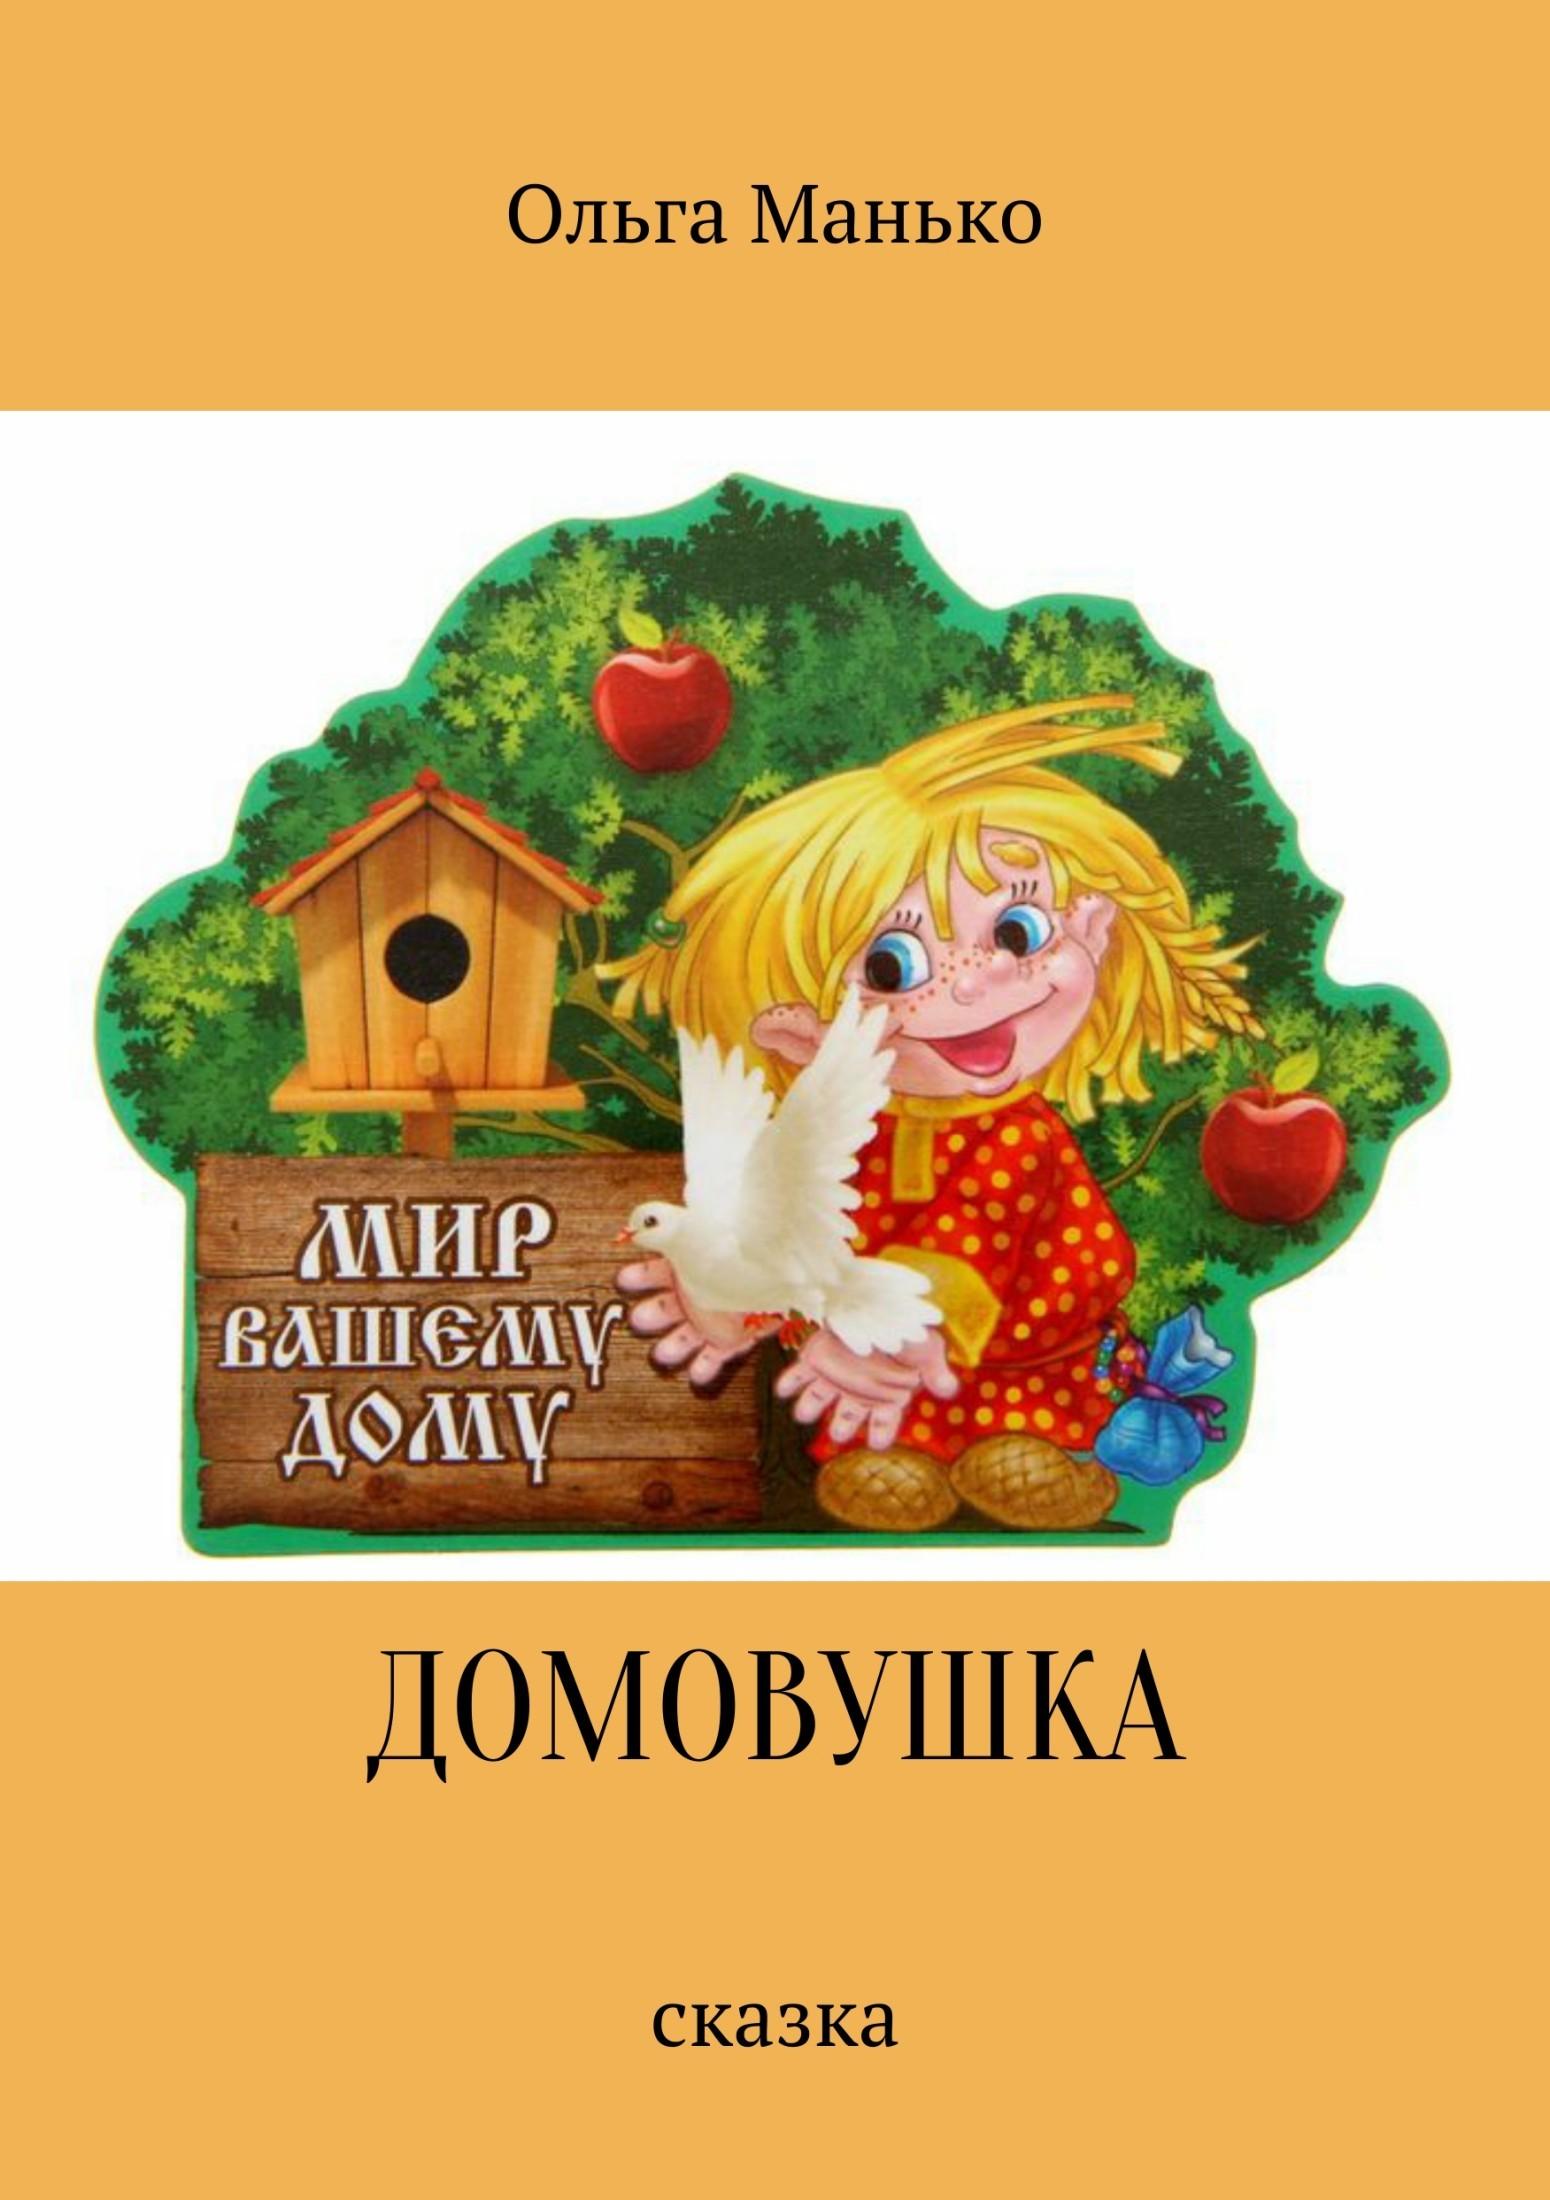 Ольга Владимировна Манько. Домовушка